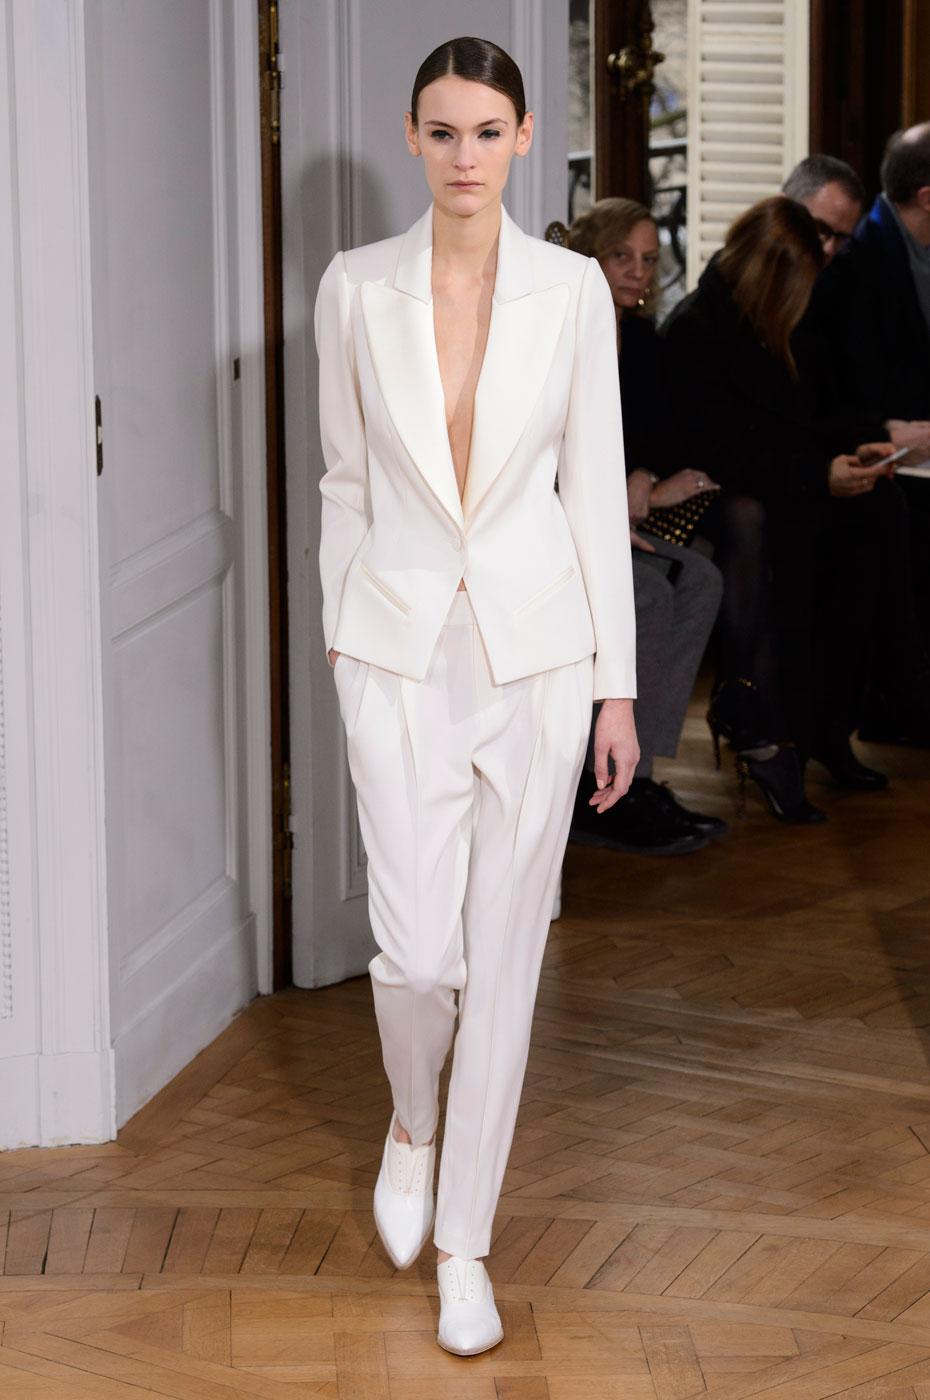 Bouchra-Jarrar-fashion-runway-show-haute-couture-paris-spring-summer-2015-the-impression-49